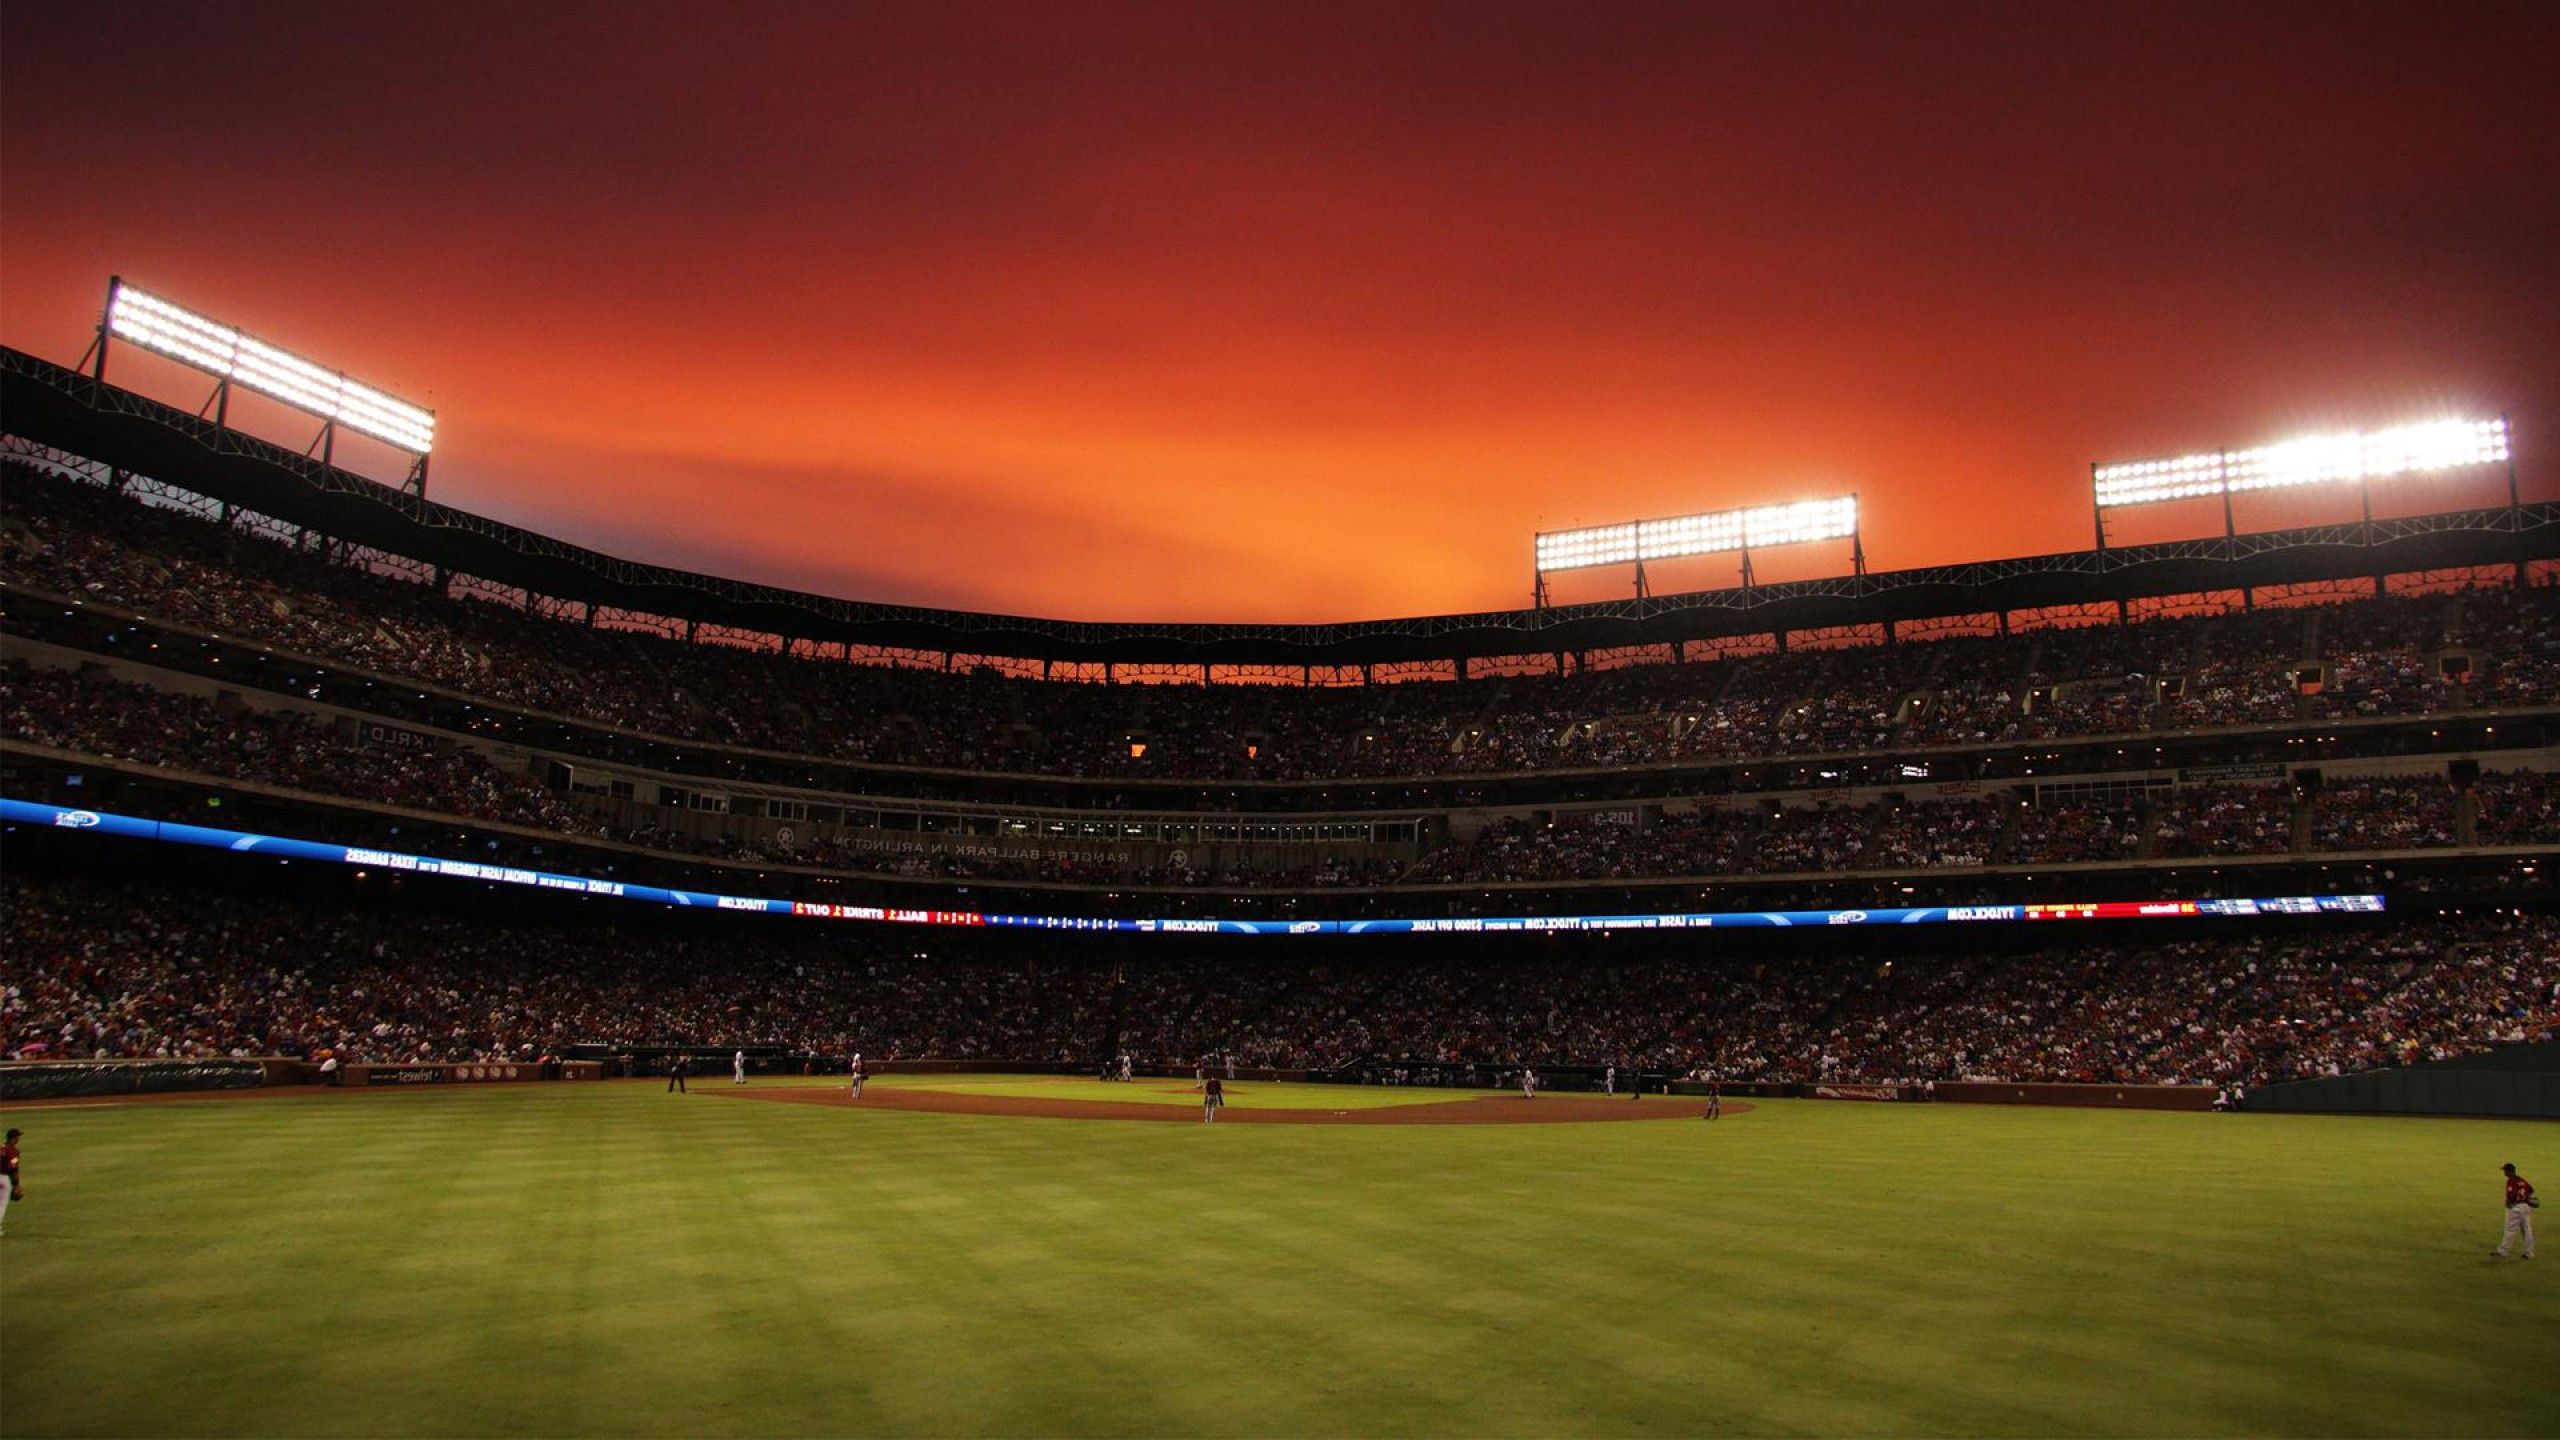 Res: 2560x1440, wallpaper baseball sports stadium